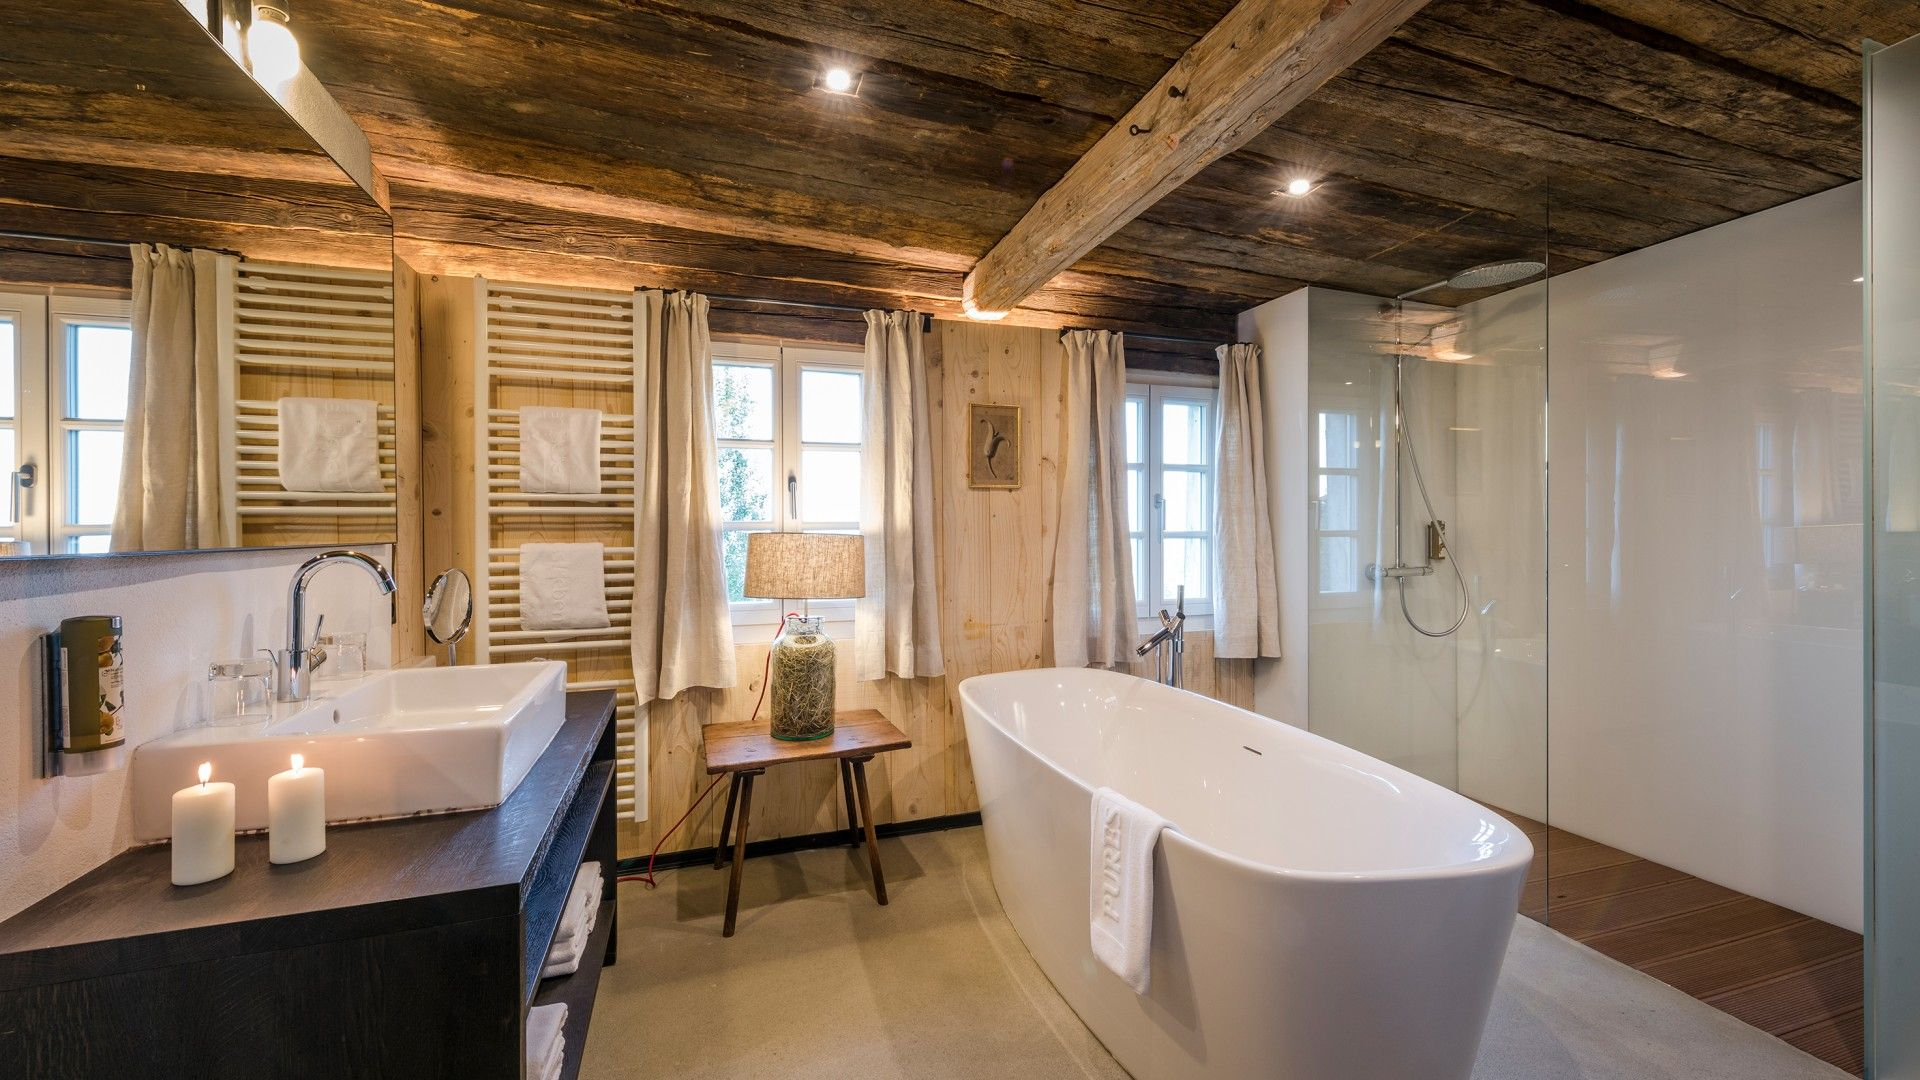 Badezimmer design hd-bilder stadlaltenbachbadezimmer  hausideen  pinterest  room